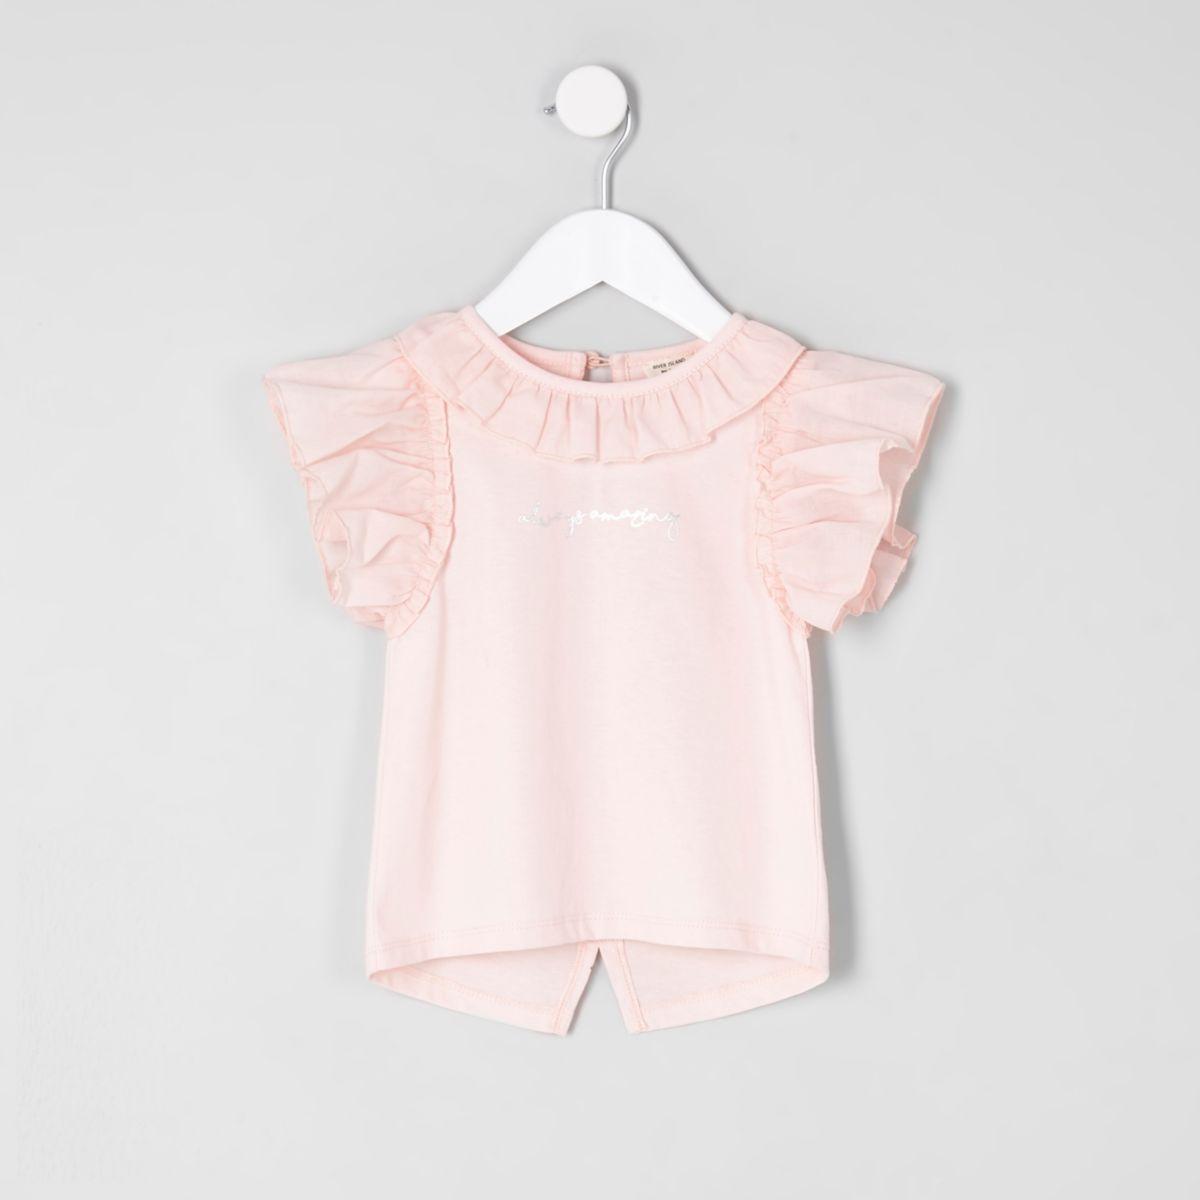 Mini girls light pink 'always amazing' top